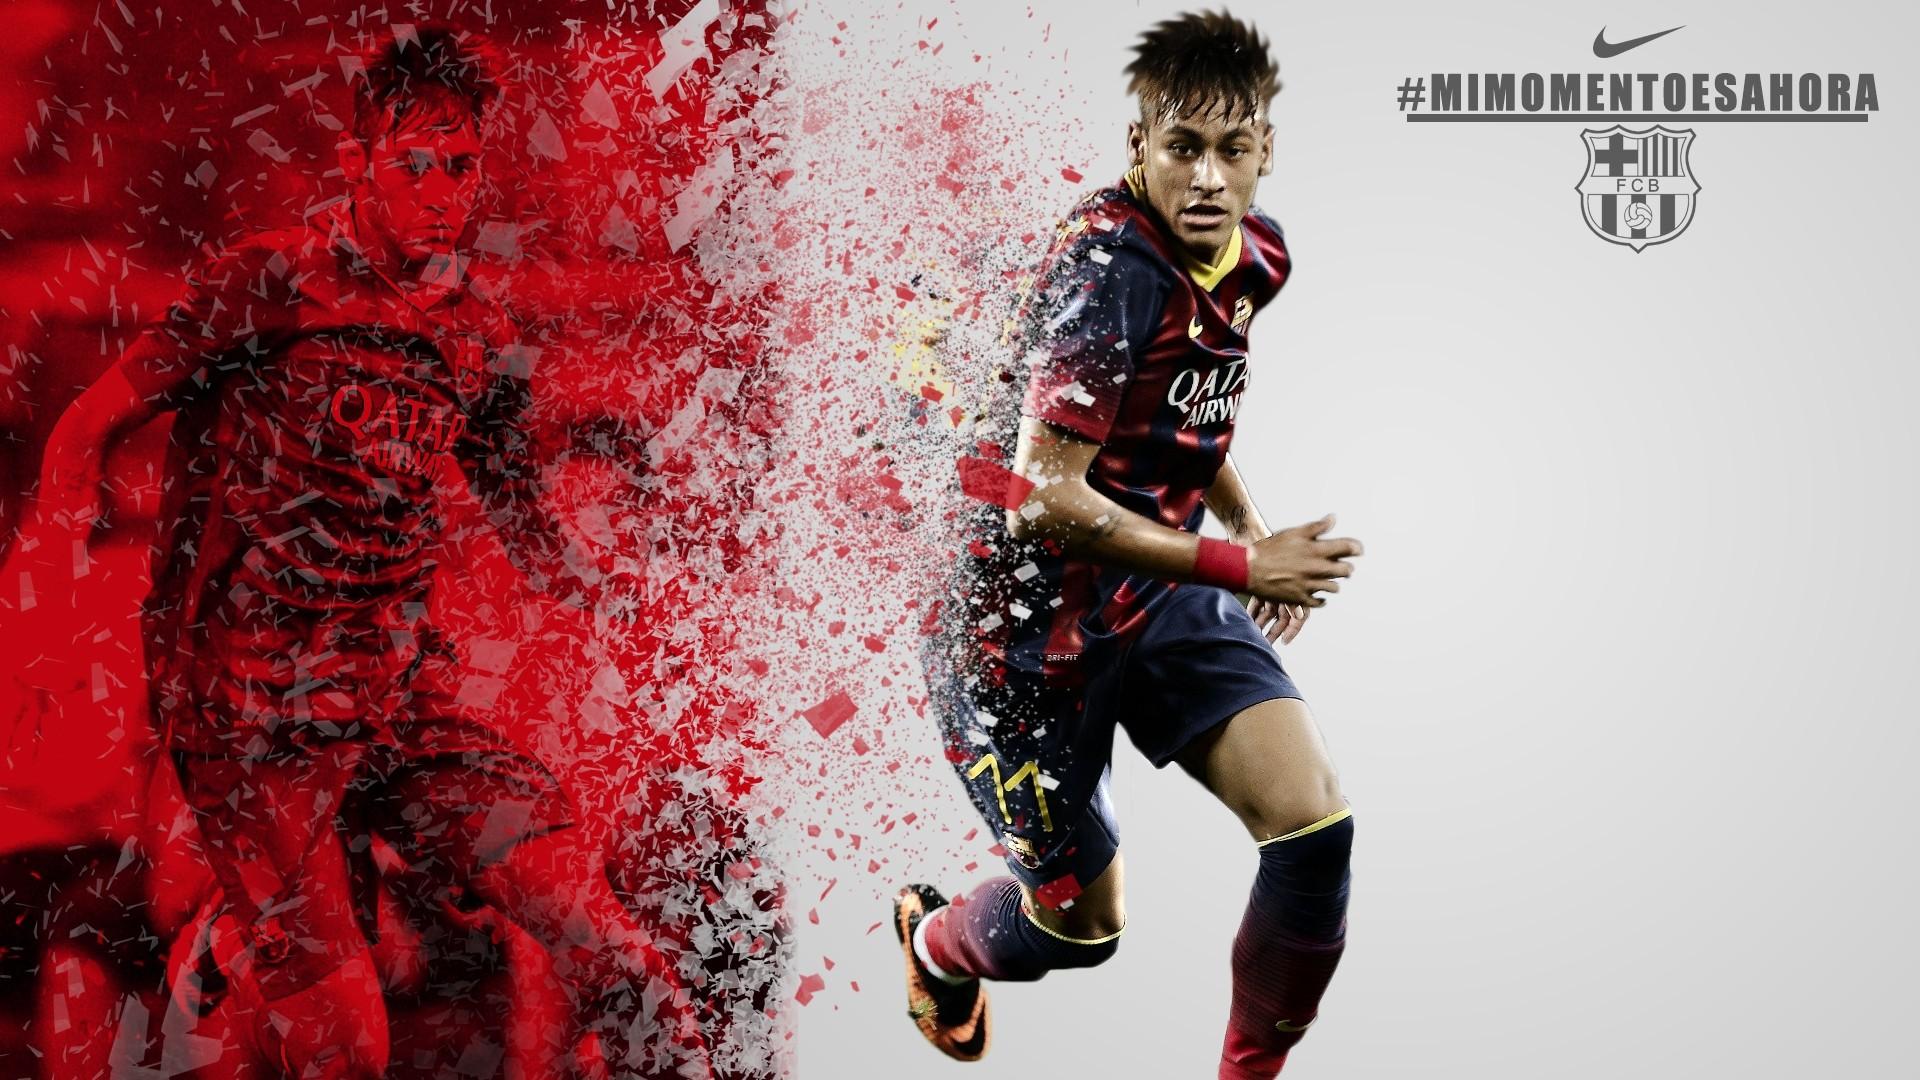 Neymar Jr hd wallpaper download